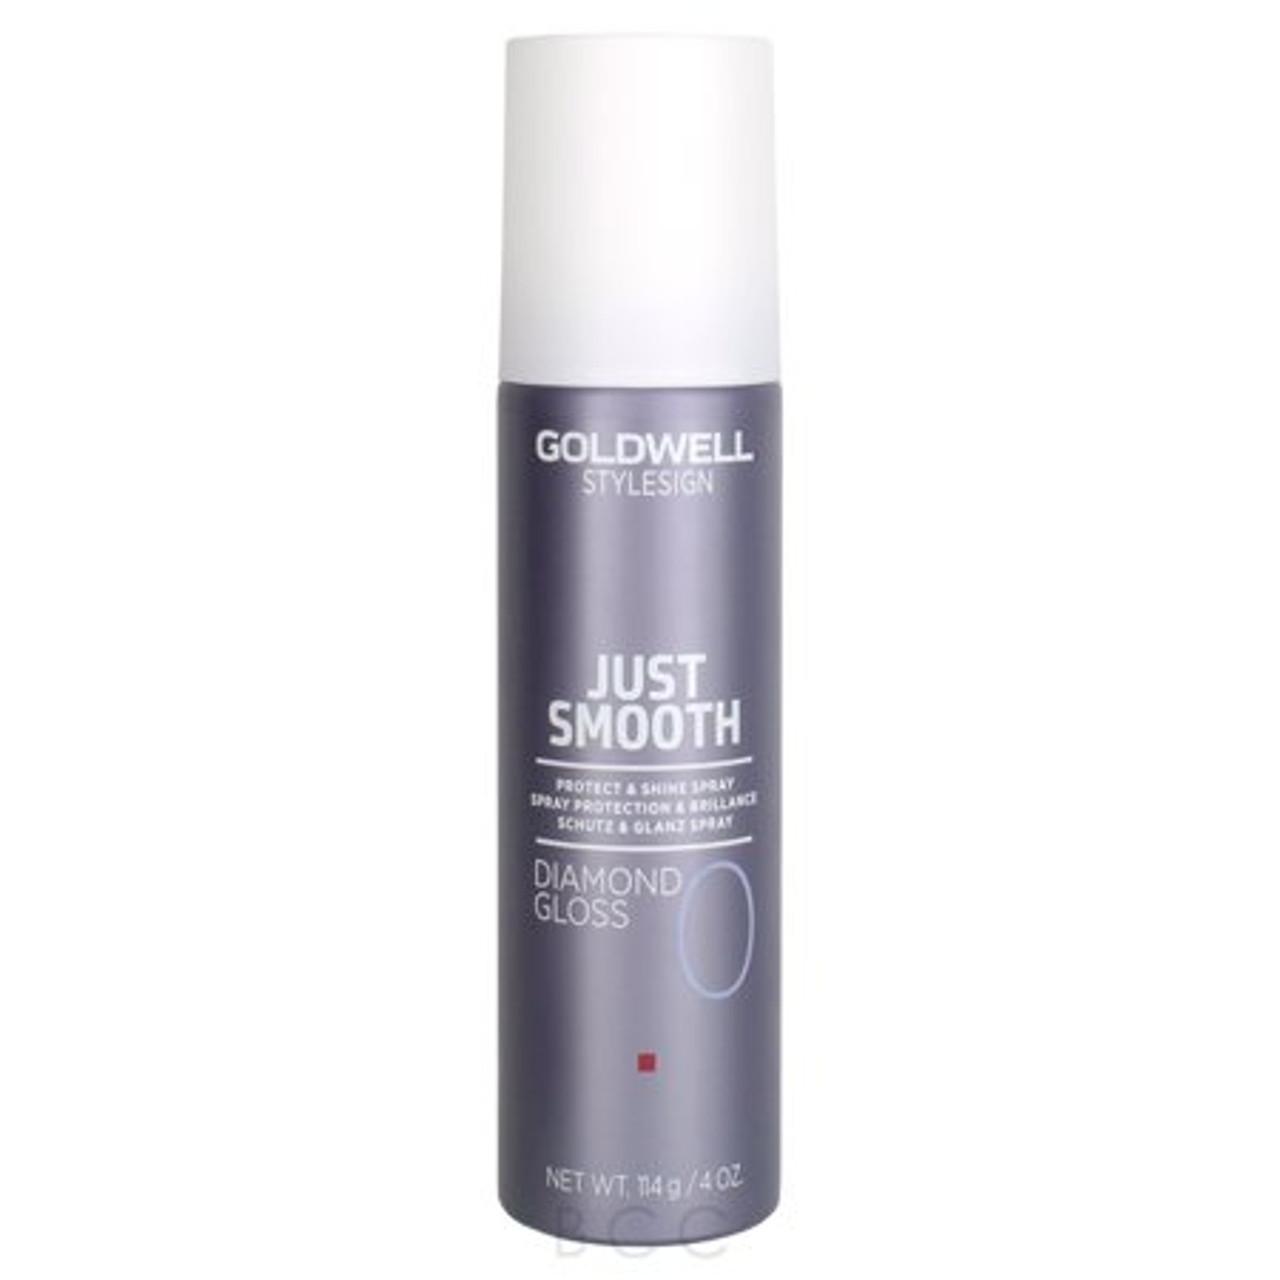 Goldwell Style Sign Diamond Gloss Shine Spray 4 oz